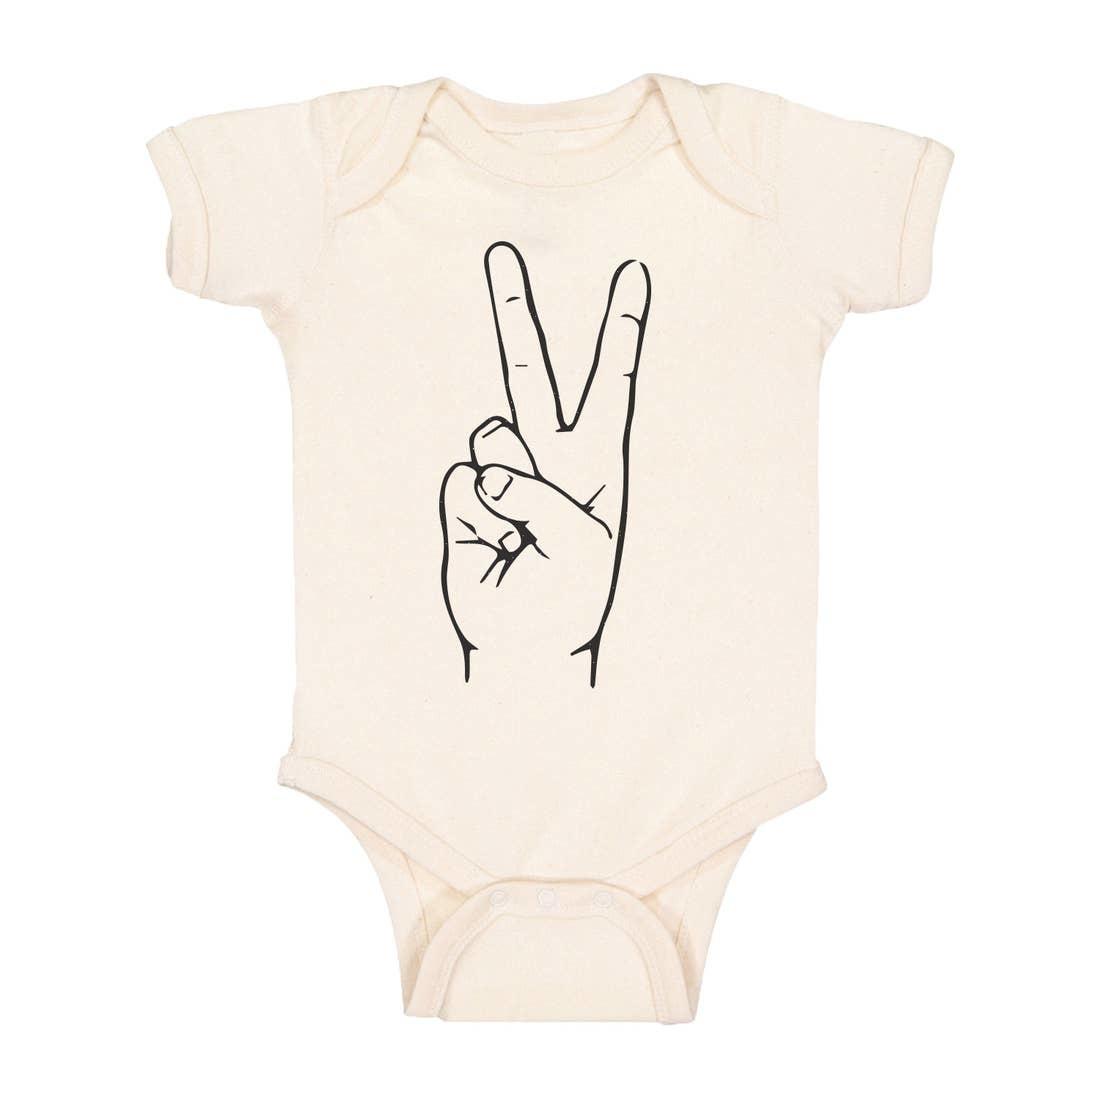 Polished Prints Polished Prints | Peace Baby Bodysuit